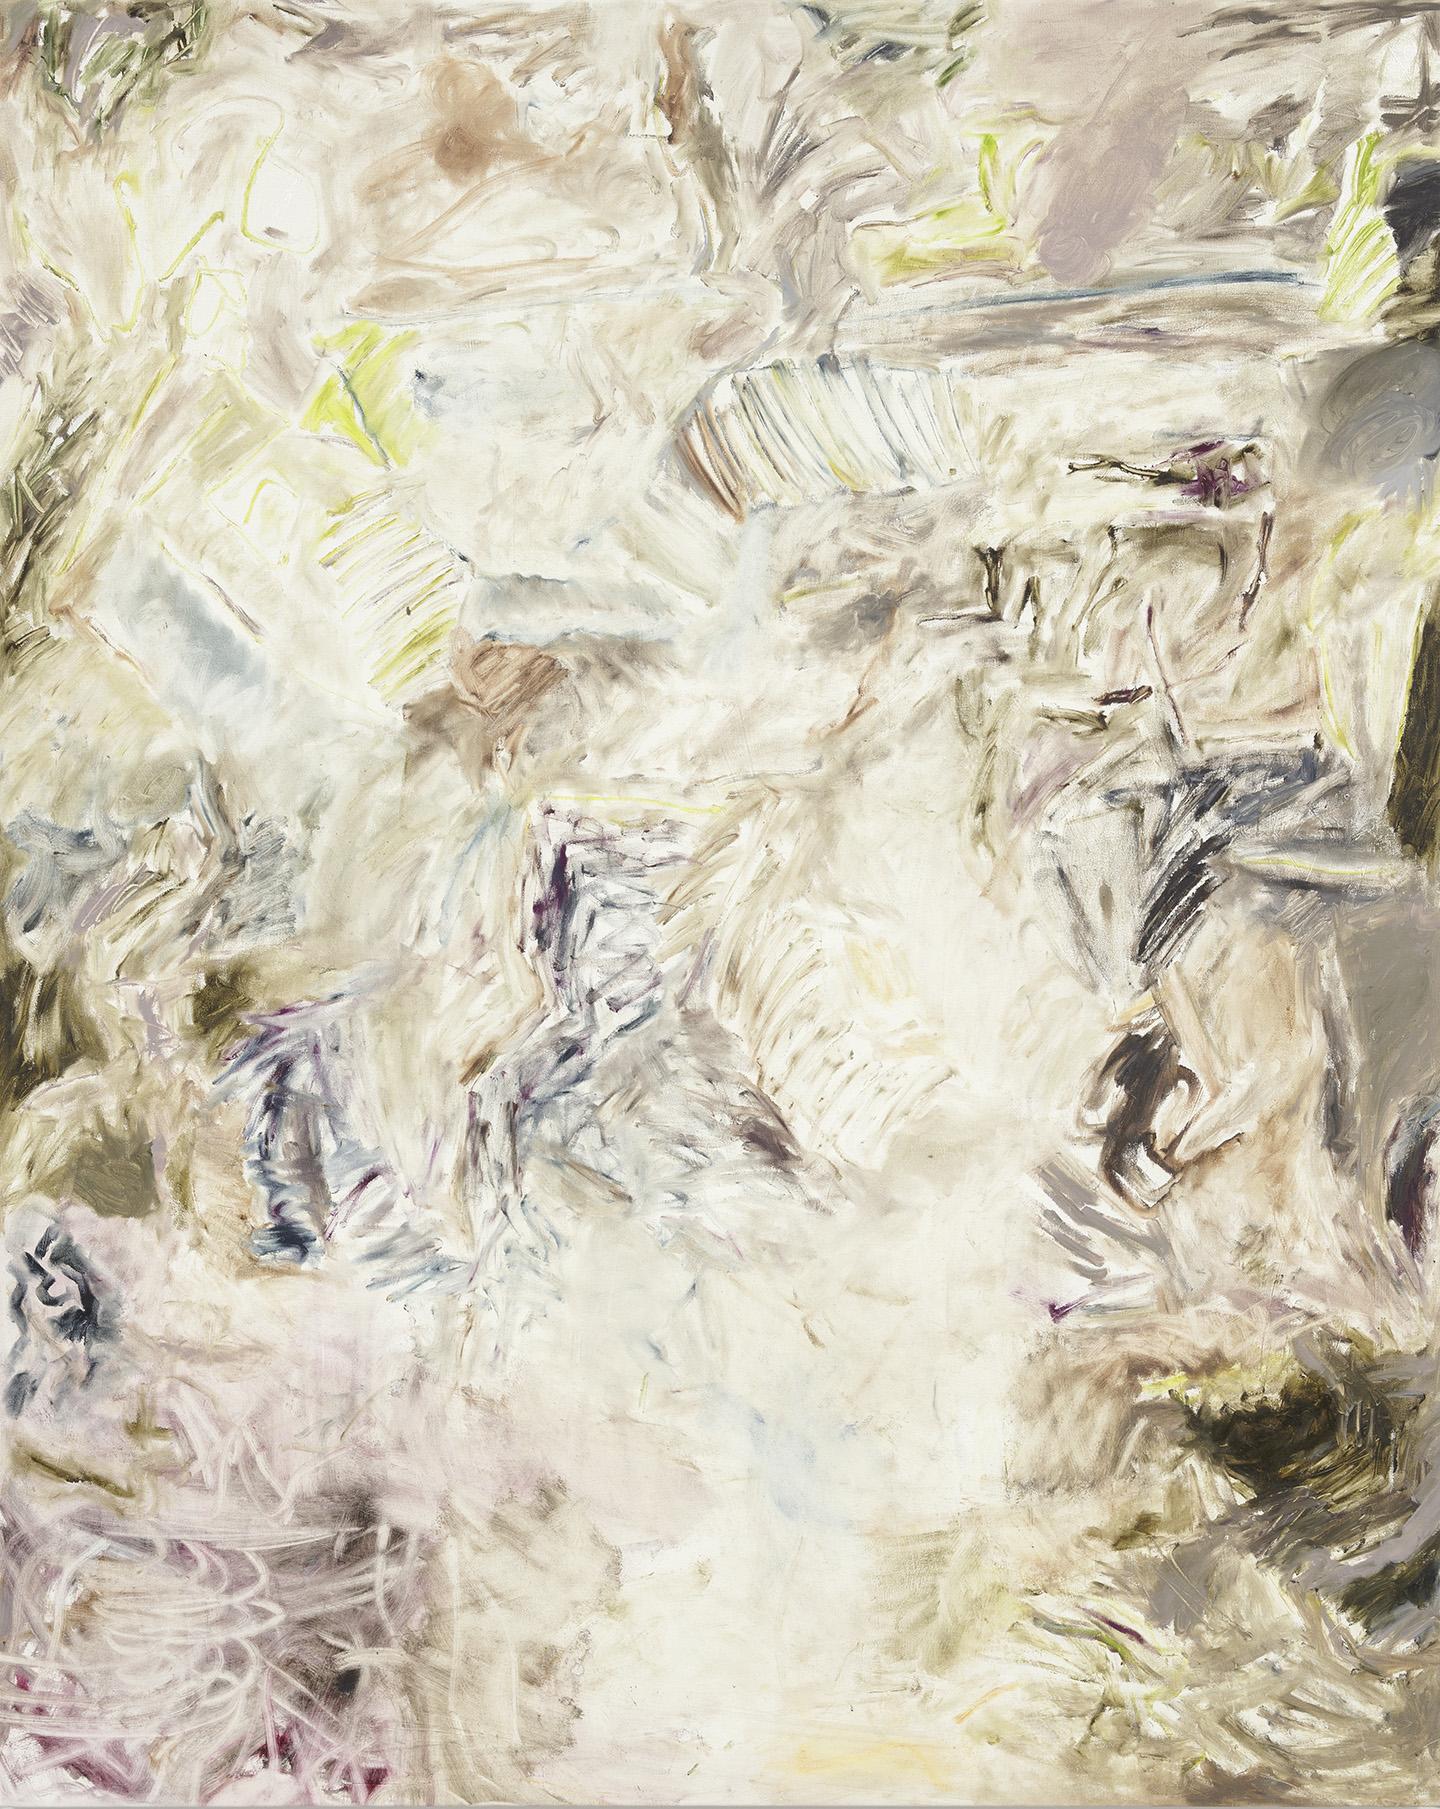 Joaquin Boz. <em>Untitled</em>, 2018. Oil on canvas, 65 1/2 x 52 1/2 inches (166.4 x 133.4 cm)